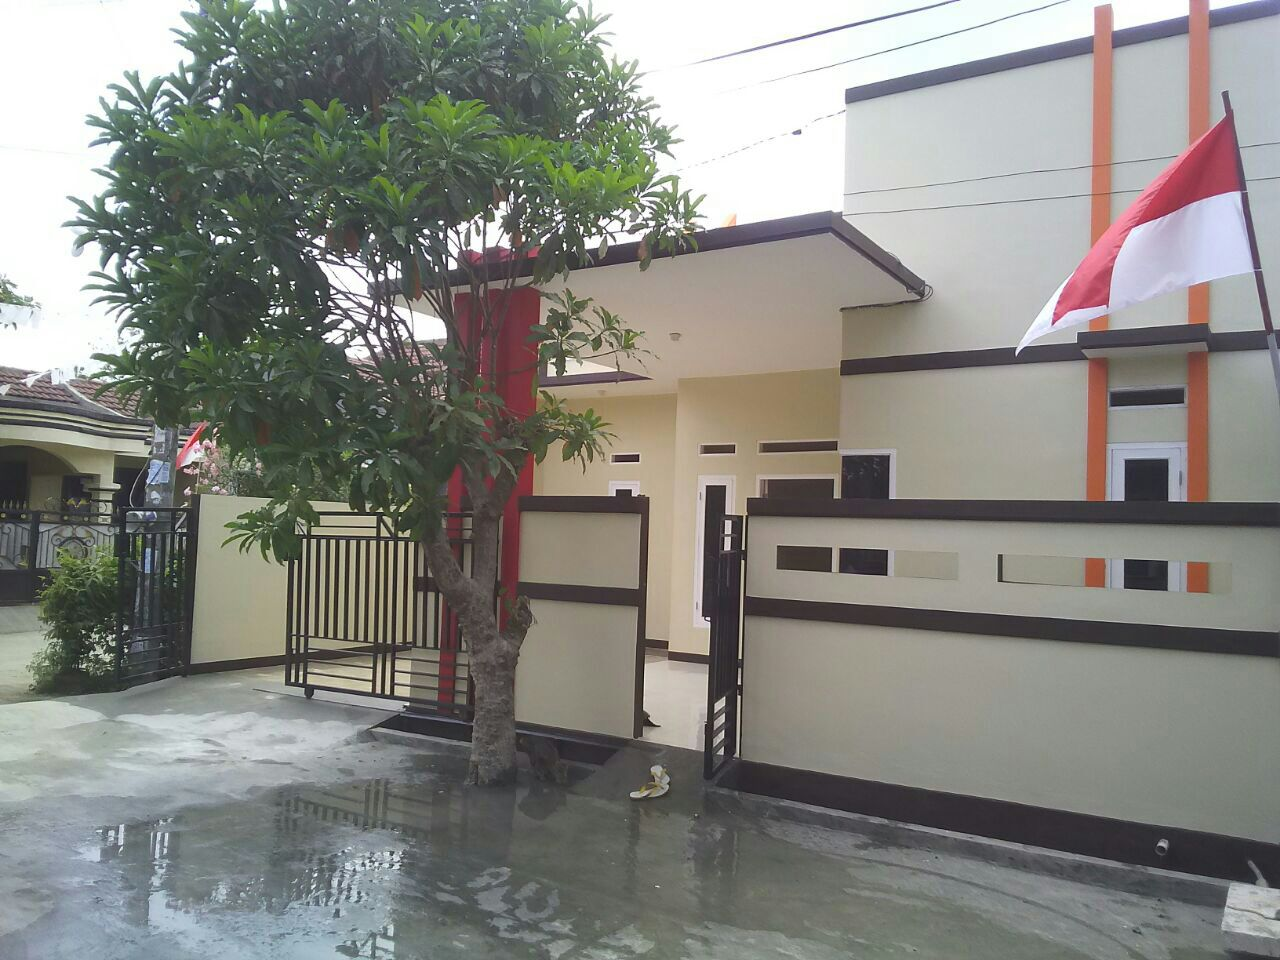 Hoek ,Rumah Baru Rumah dijual di Villa Mutiara Gading ,Bekasi Utara ,Bekasi